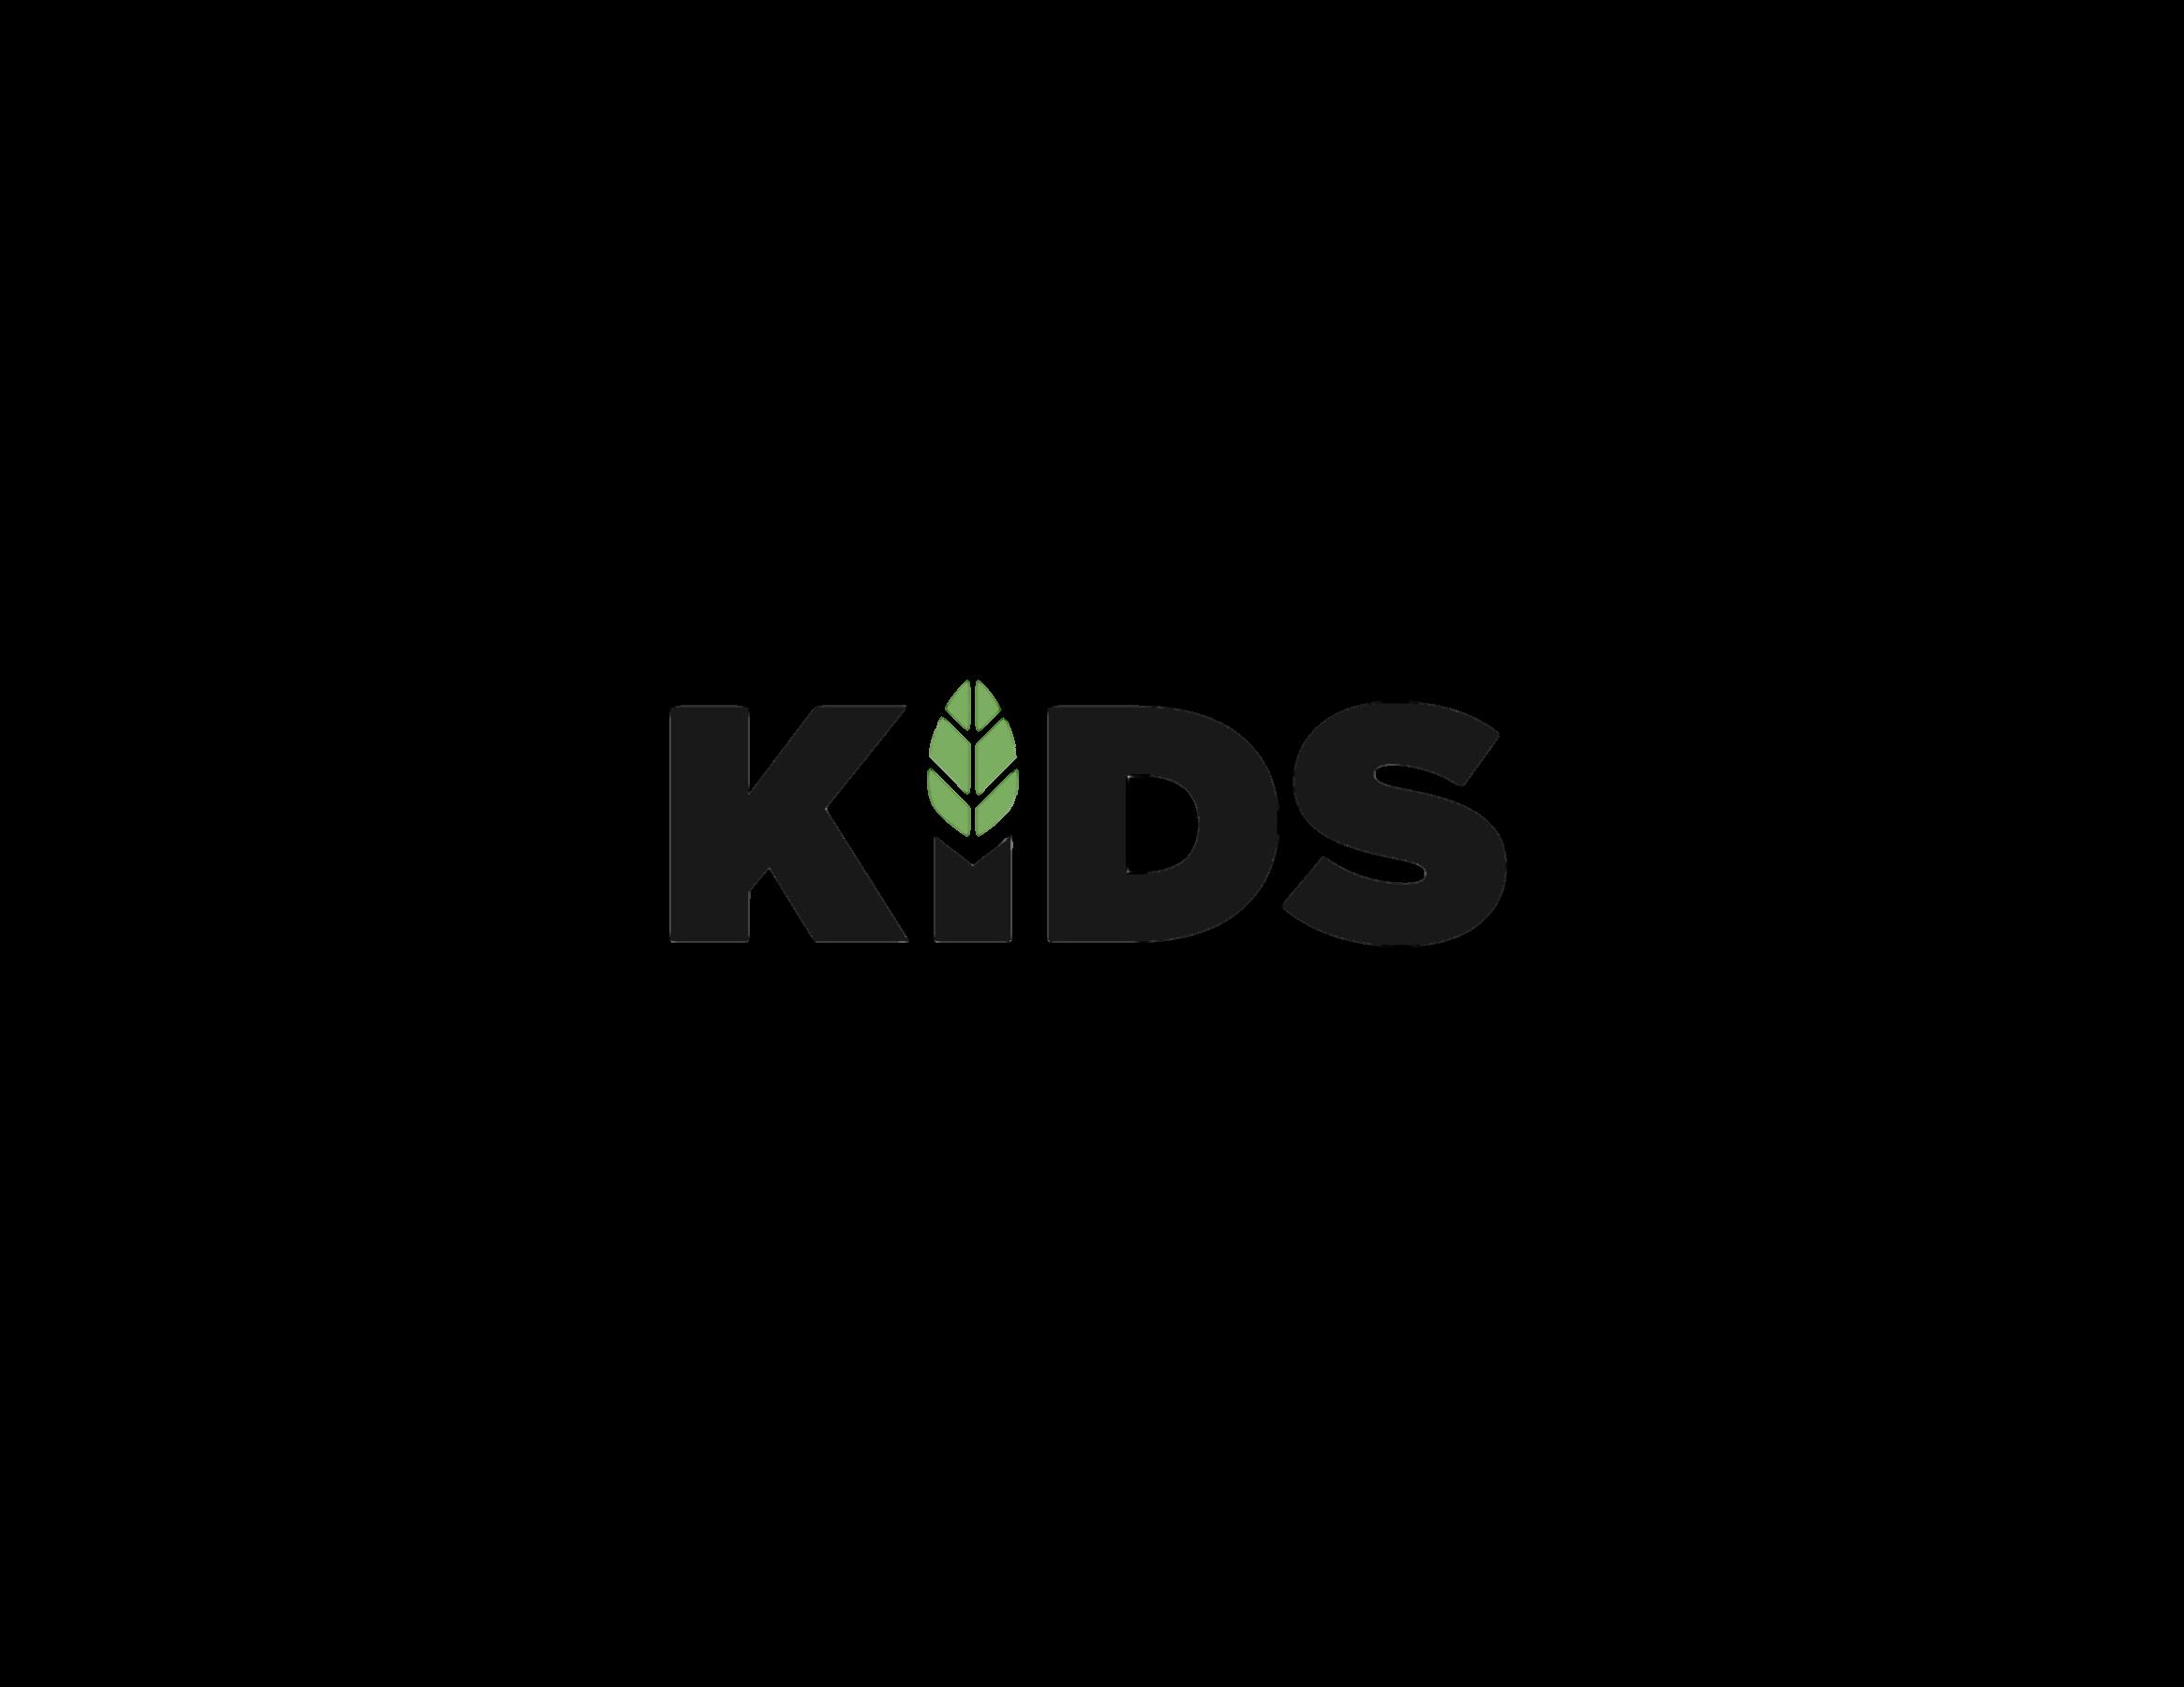 Seeds KIDS